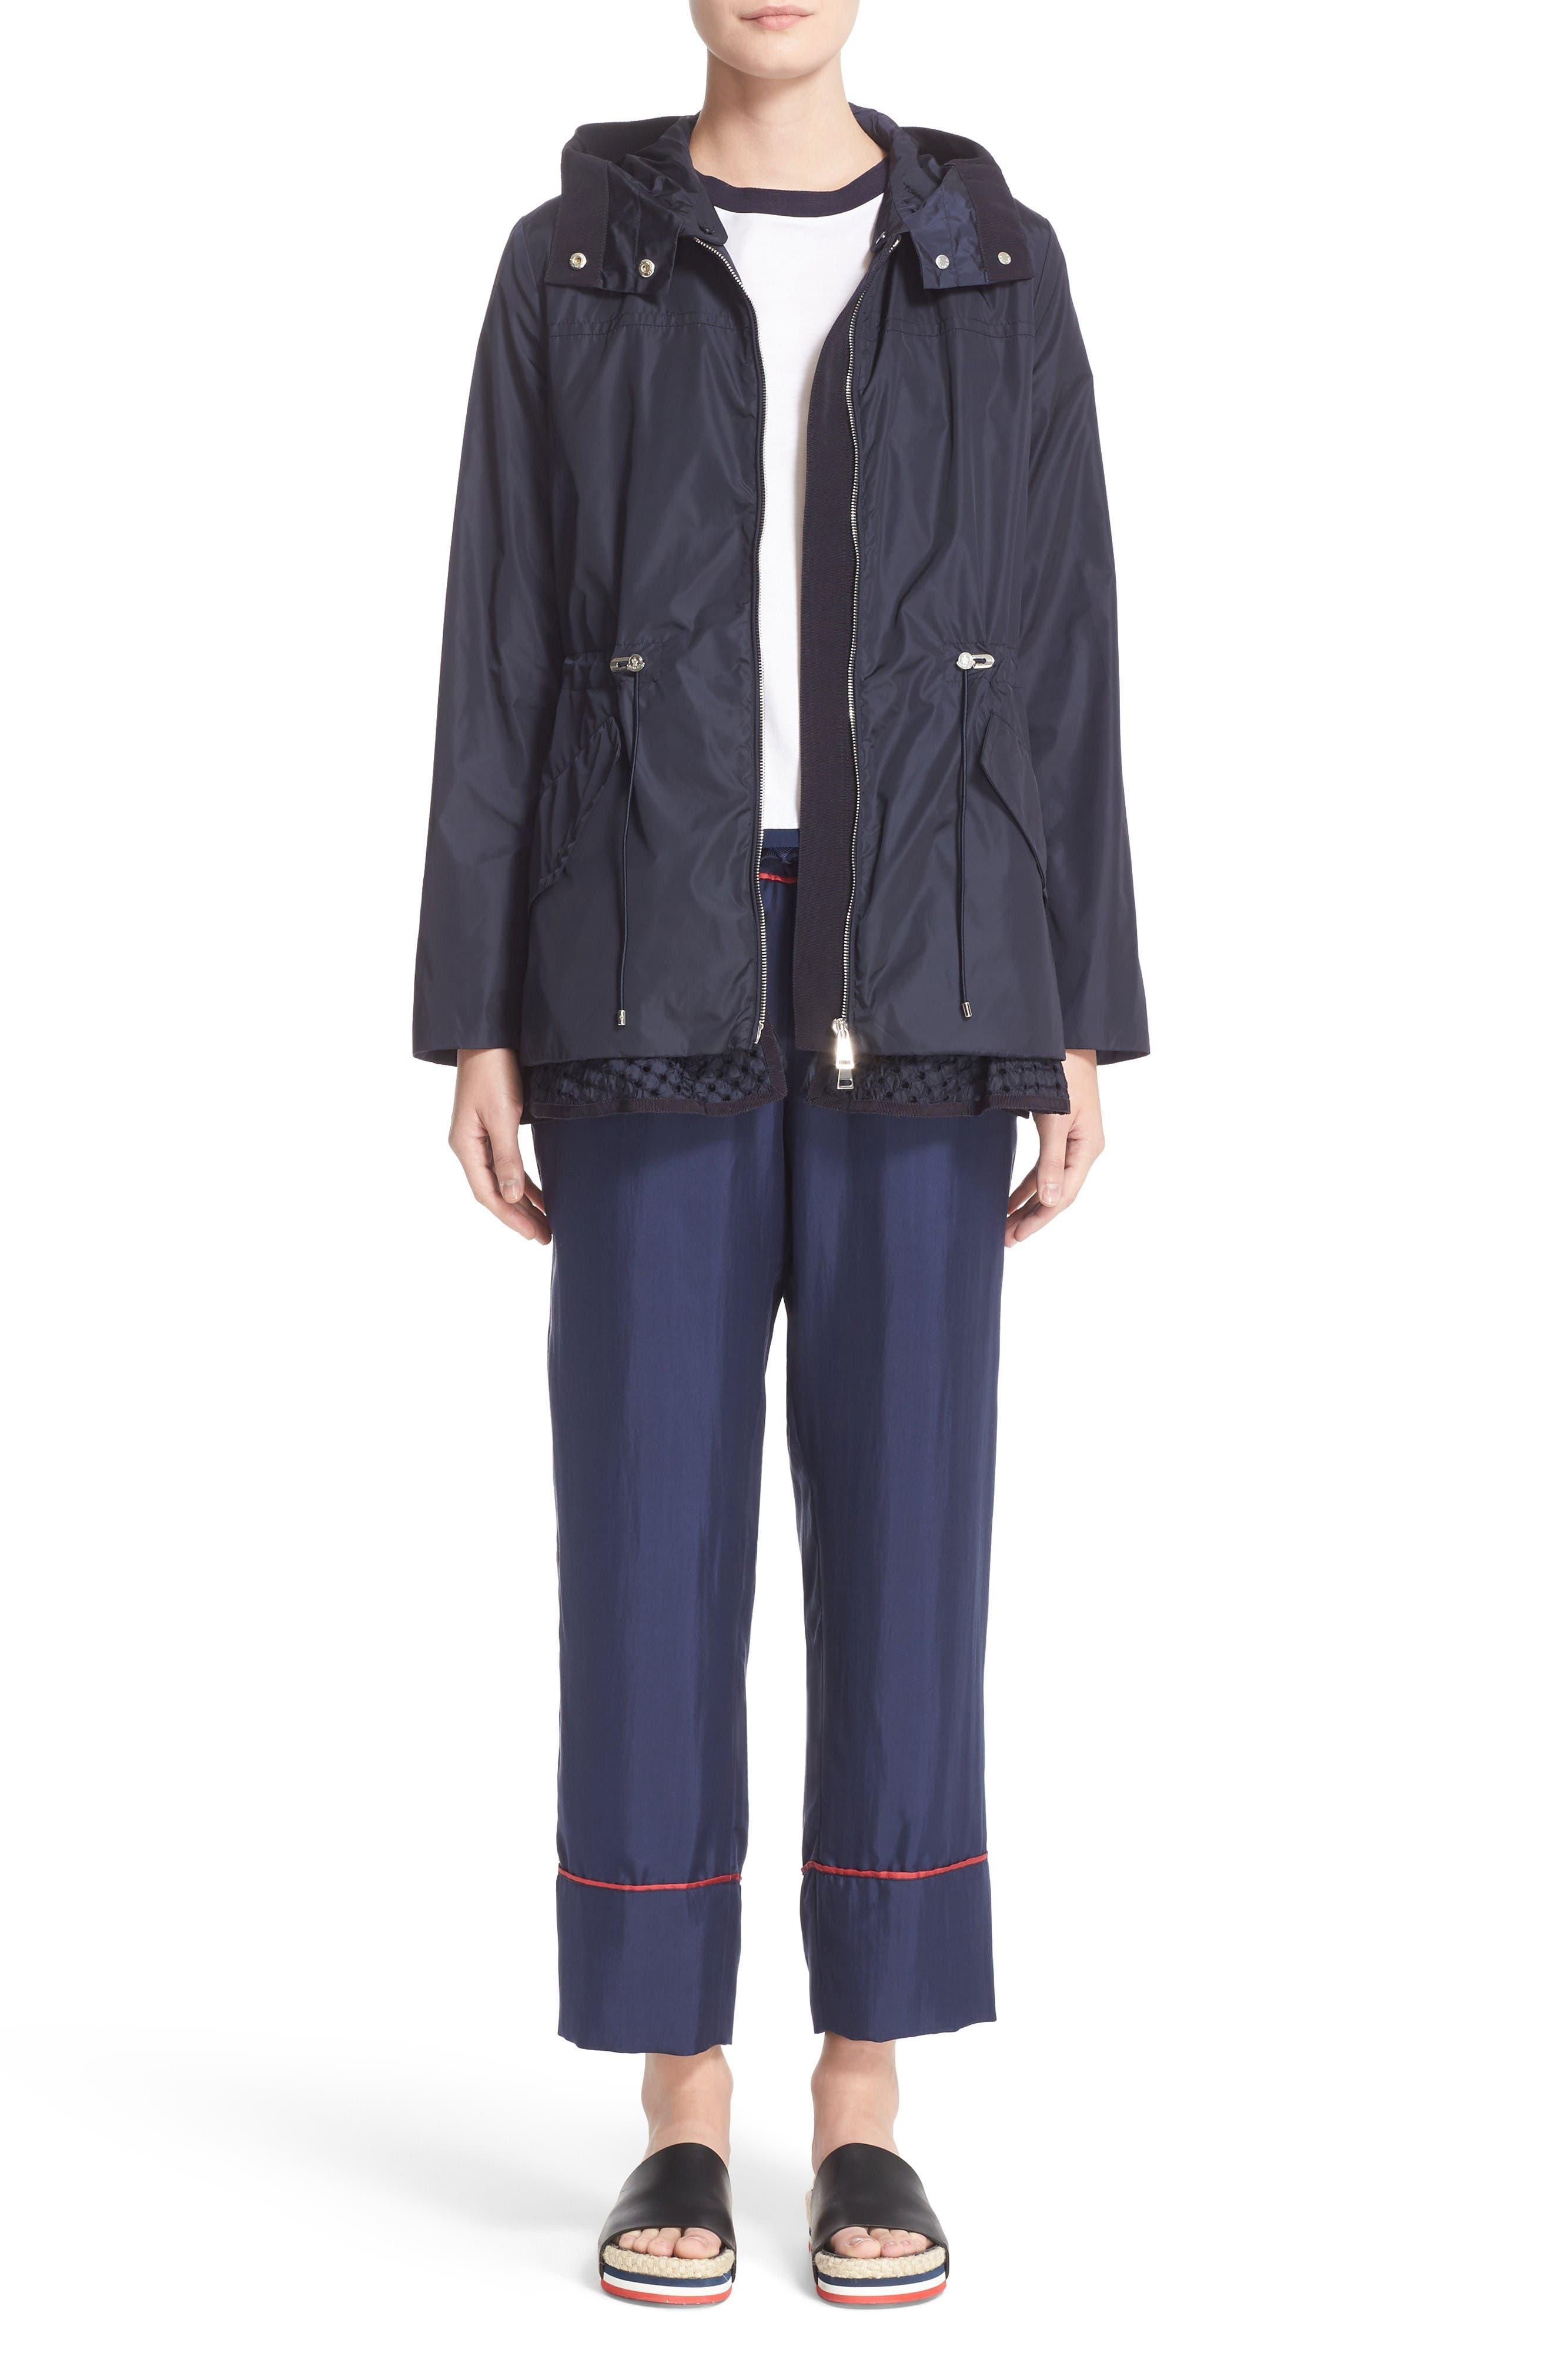 Lotus Water Resistant Peplum Raincoat,                             Alternate thumbnail 7, color,                             Navy